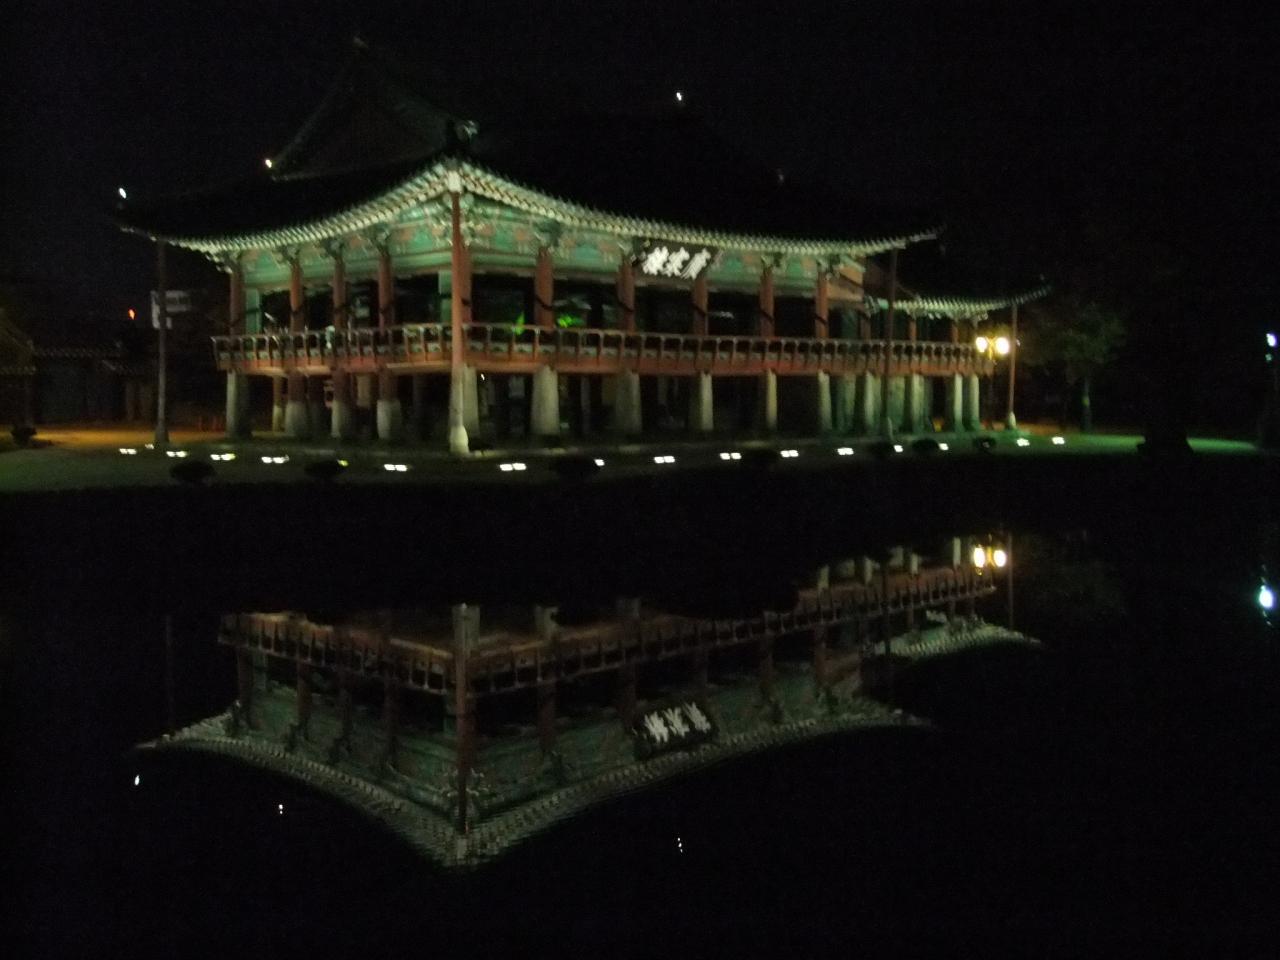 No13.韓国15日間レンタカー周遊の旅:順天オープンセット場、春香伝パーク、広寒楼苑